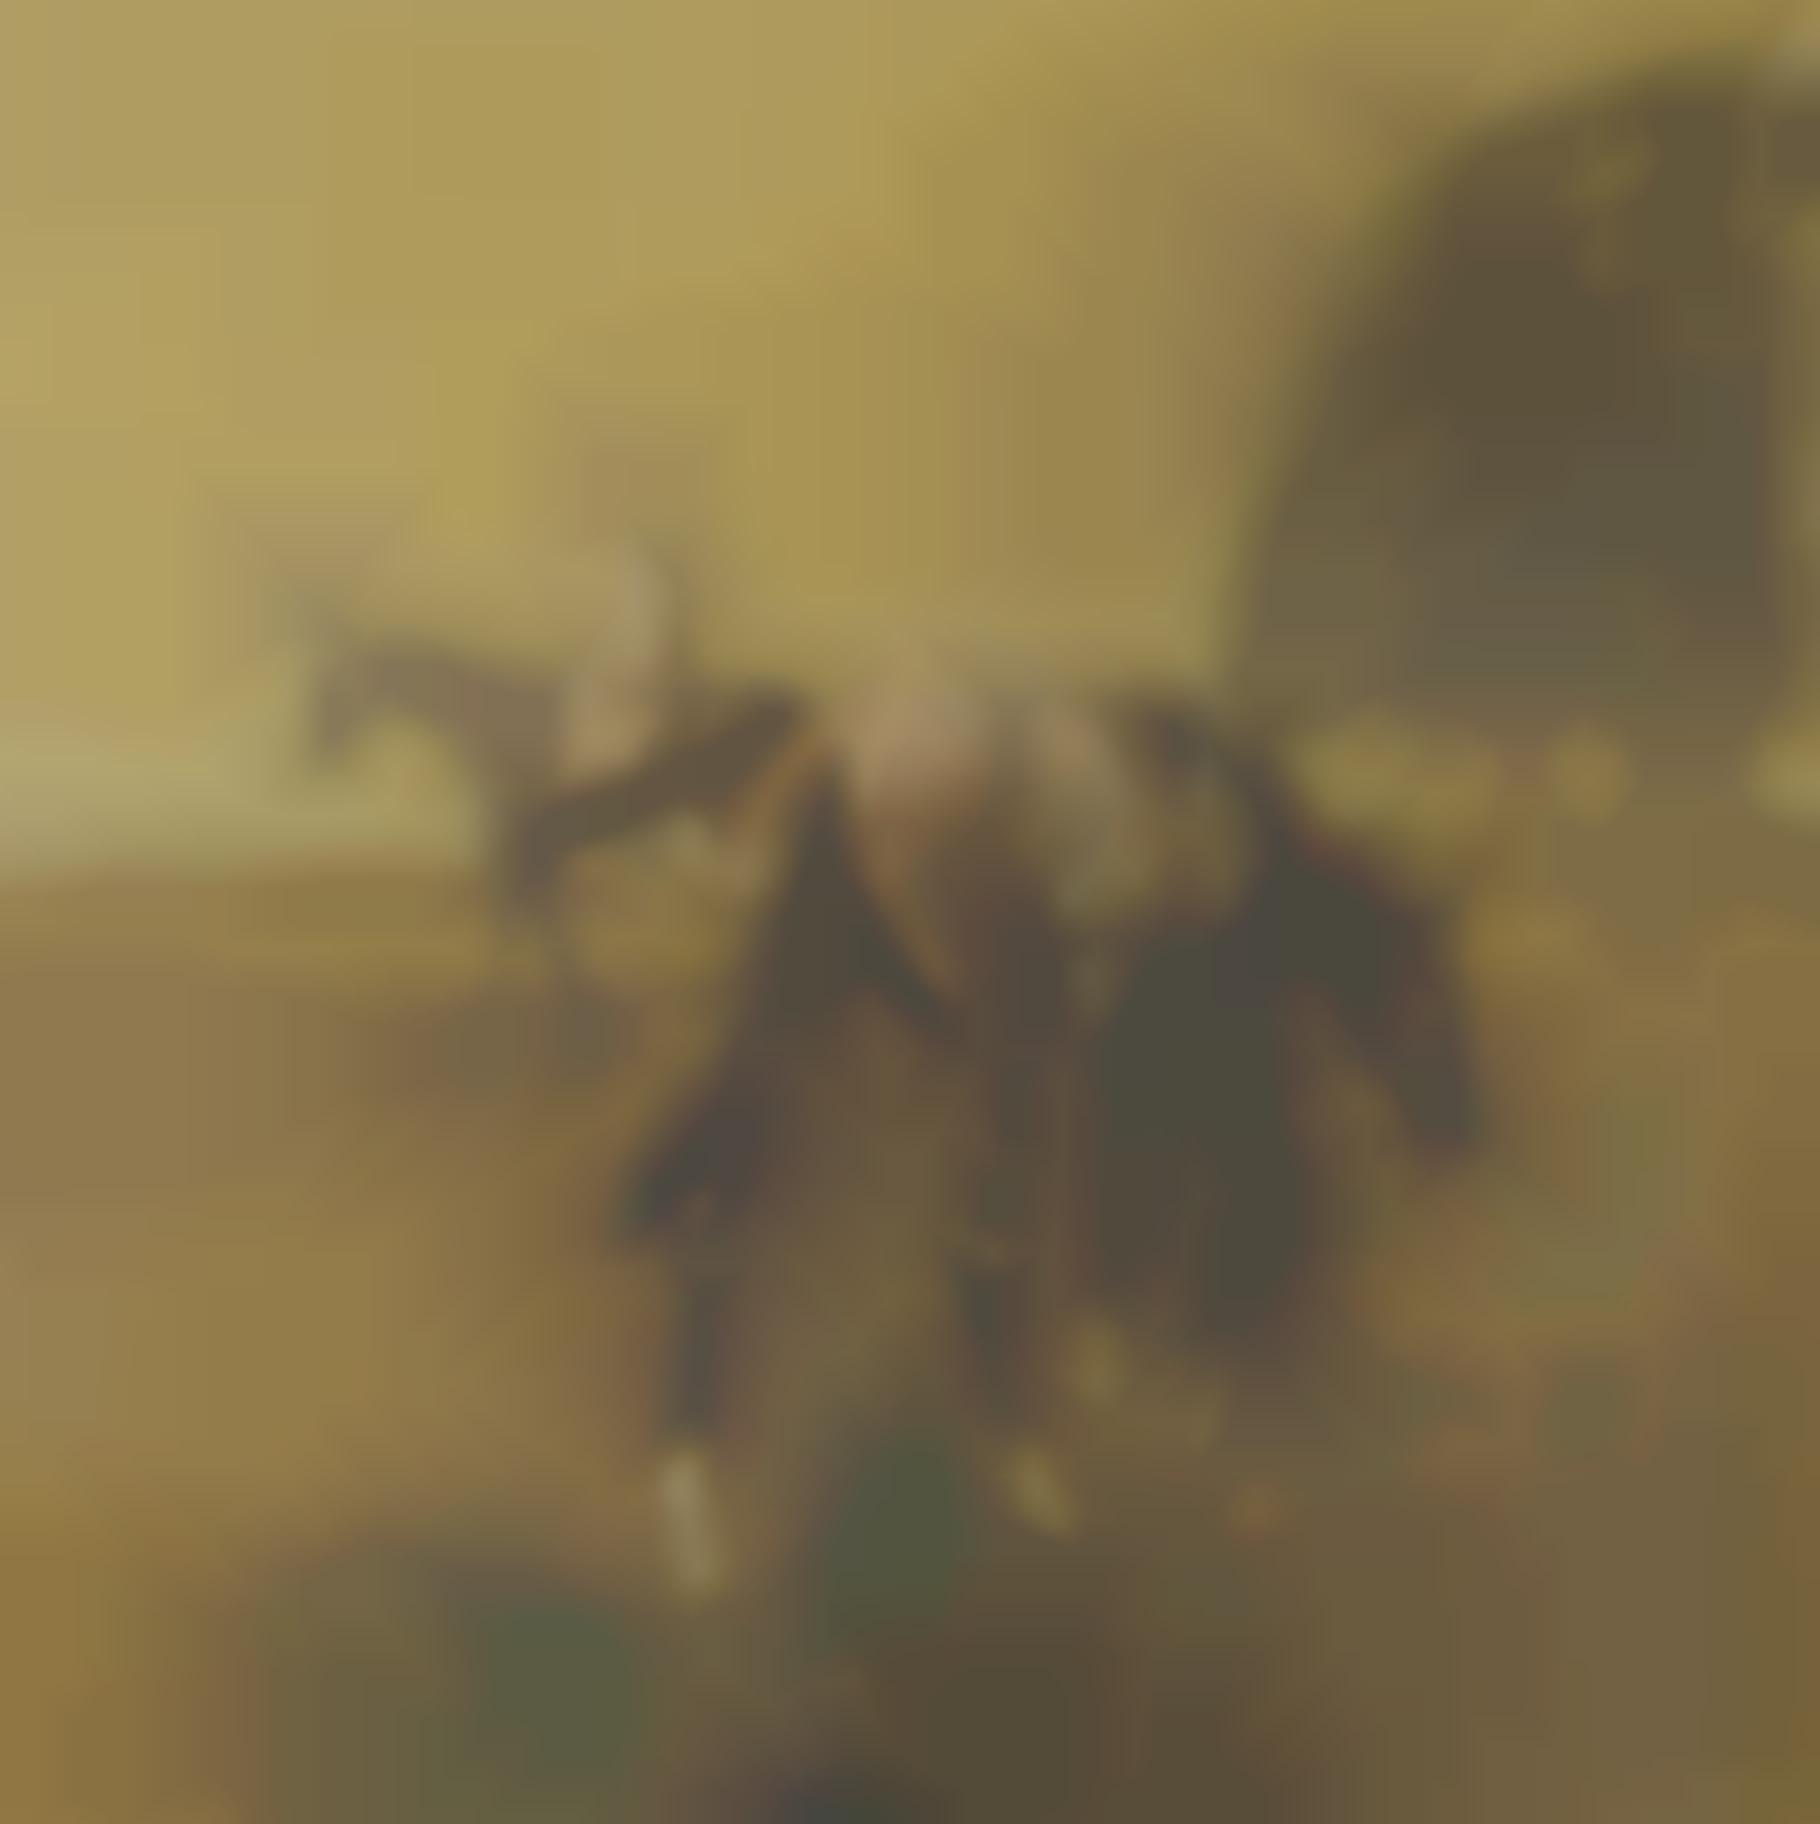 Basil Blackshaw H.R.H.A - Racehorses Exercising I-